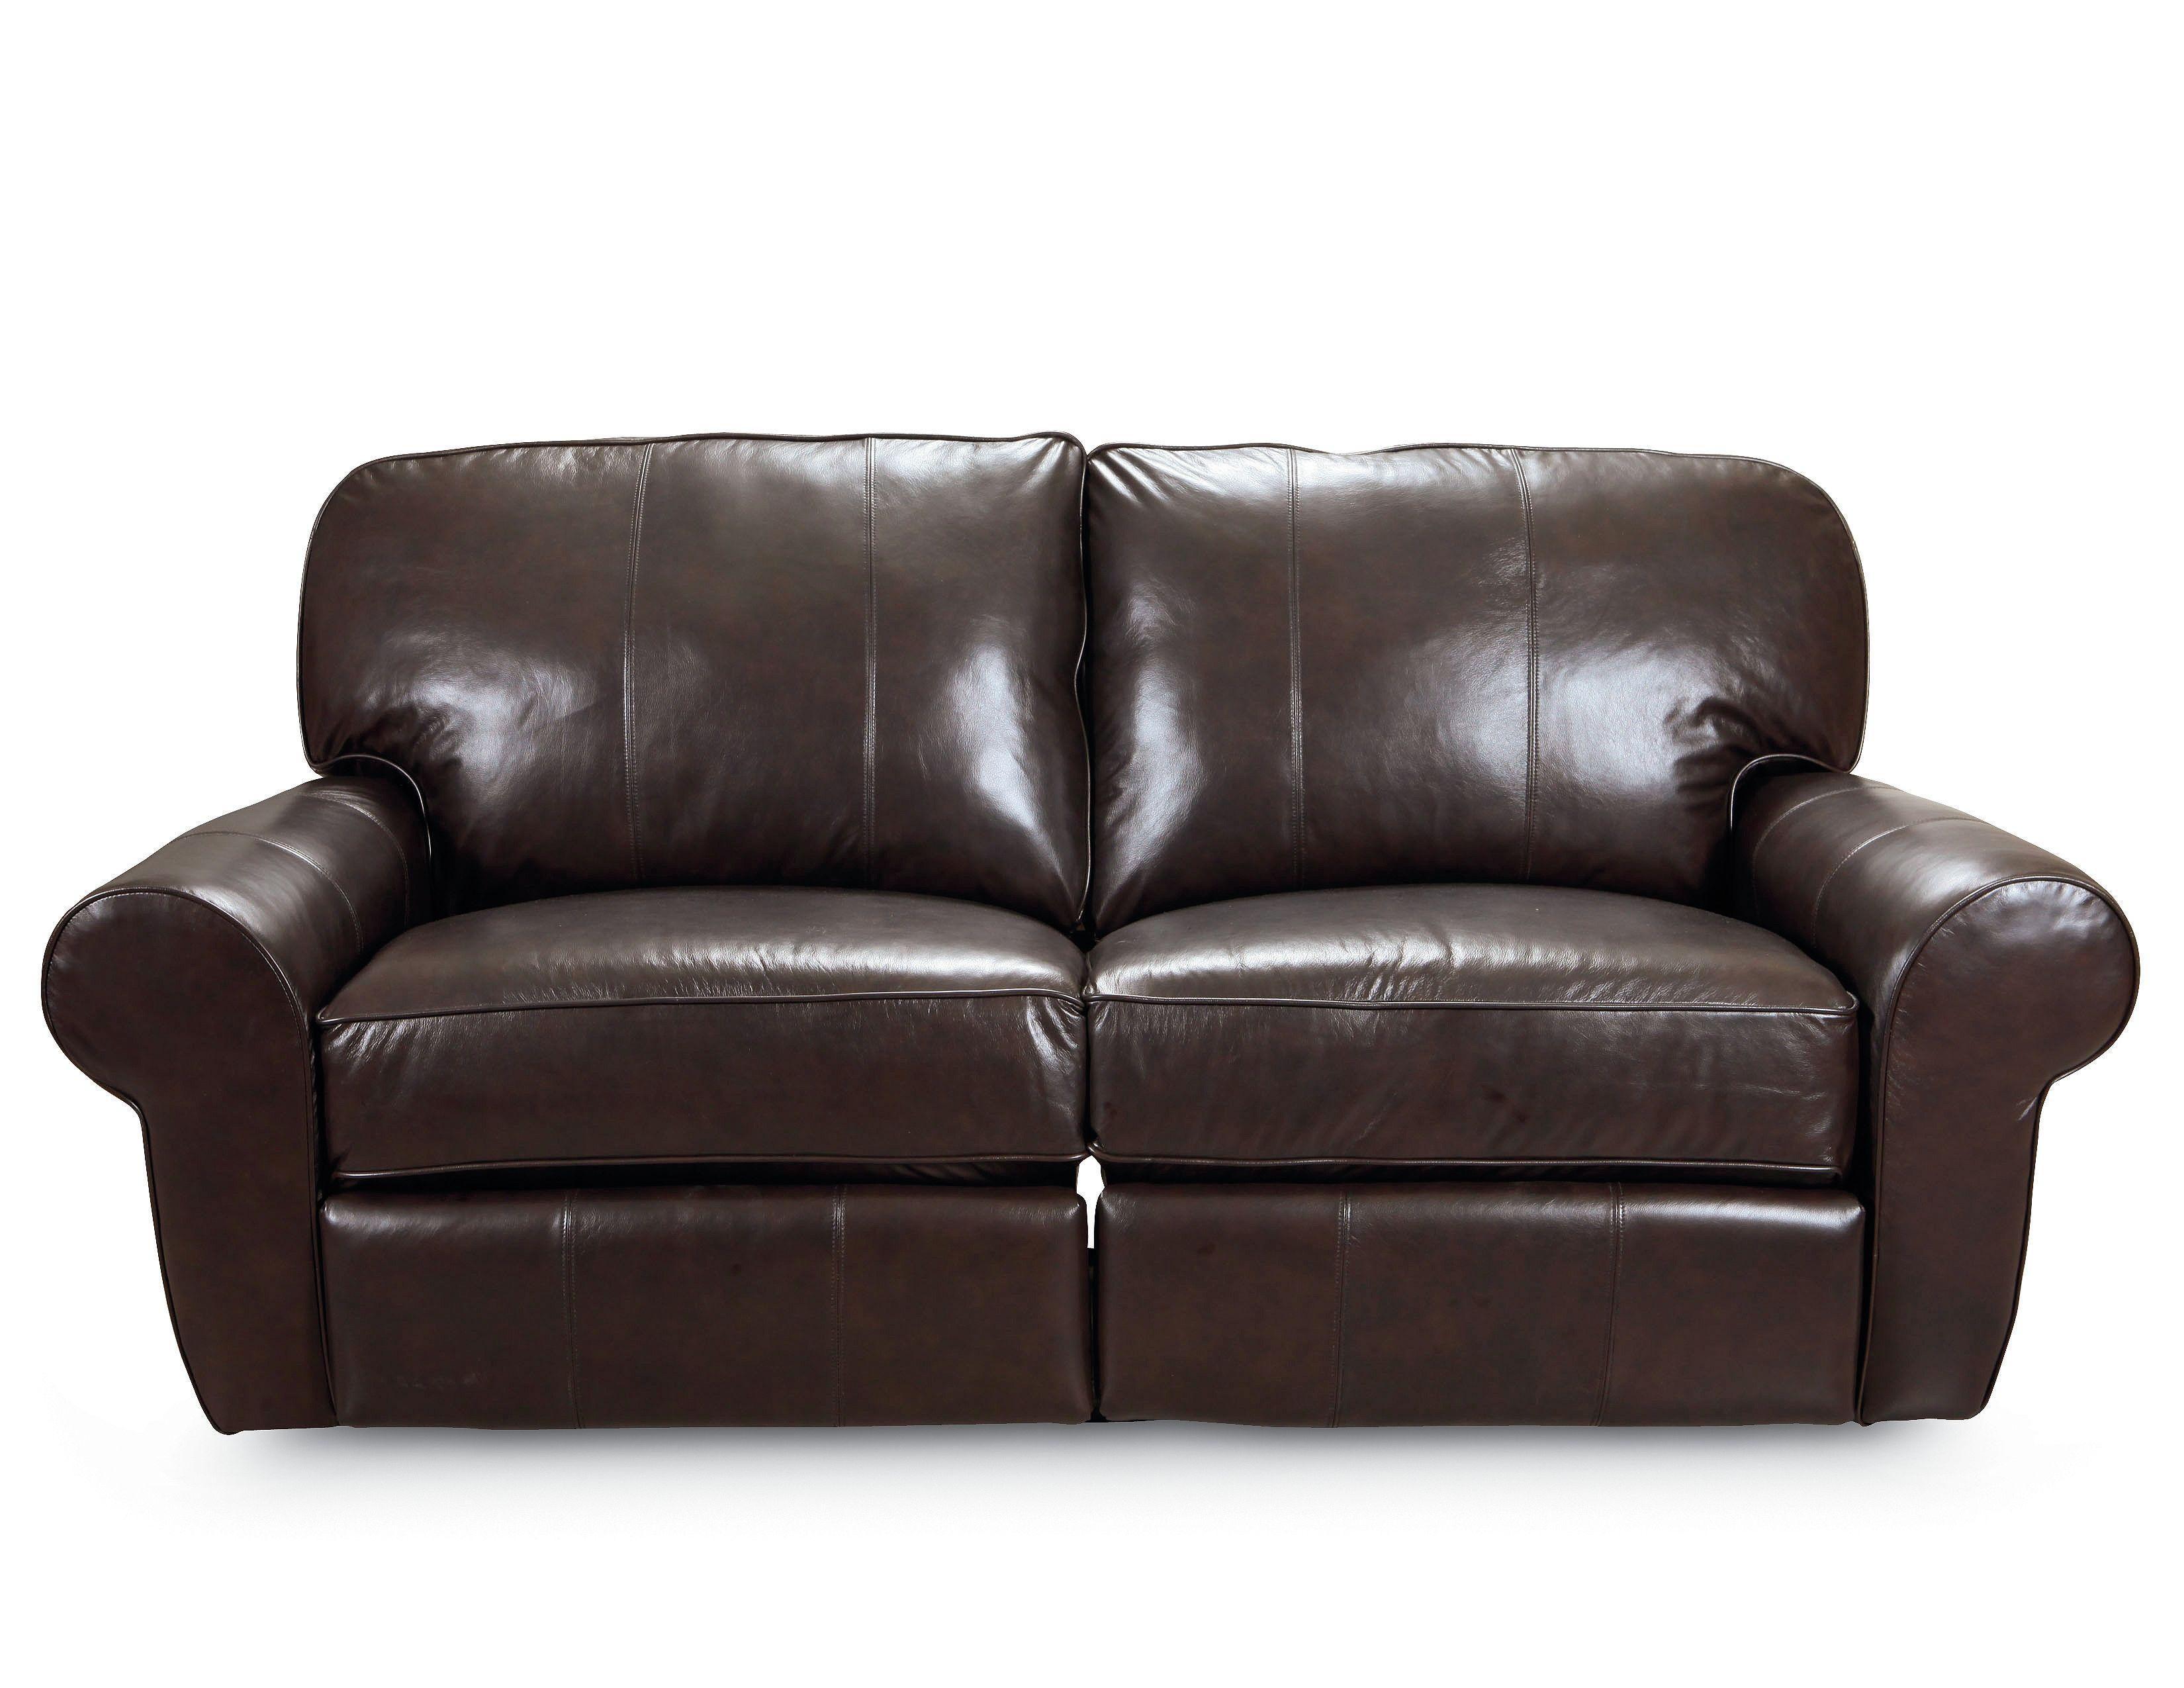 lane dual power reclining sofa cheap cool sofas megan double ahfa